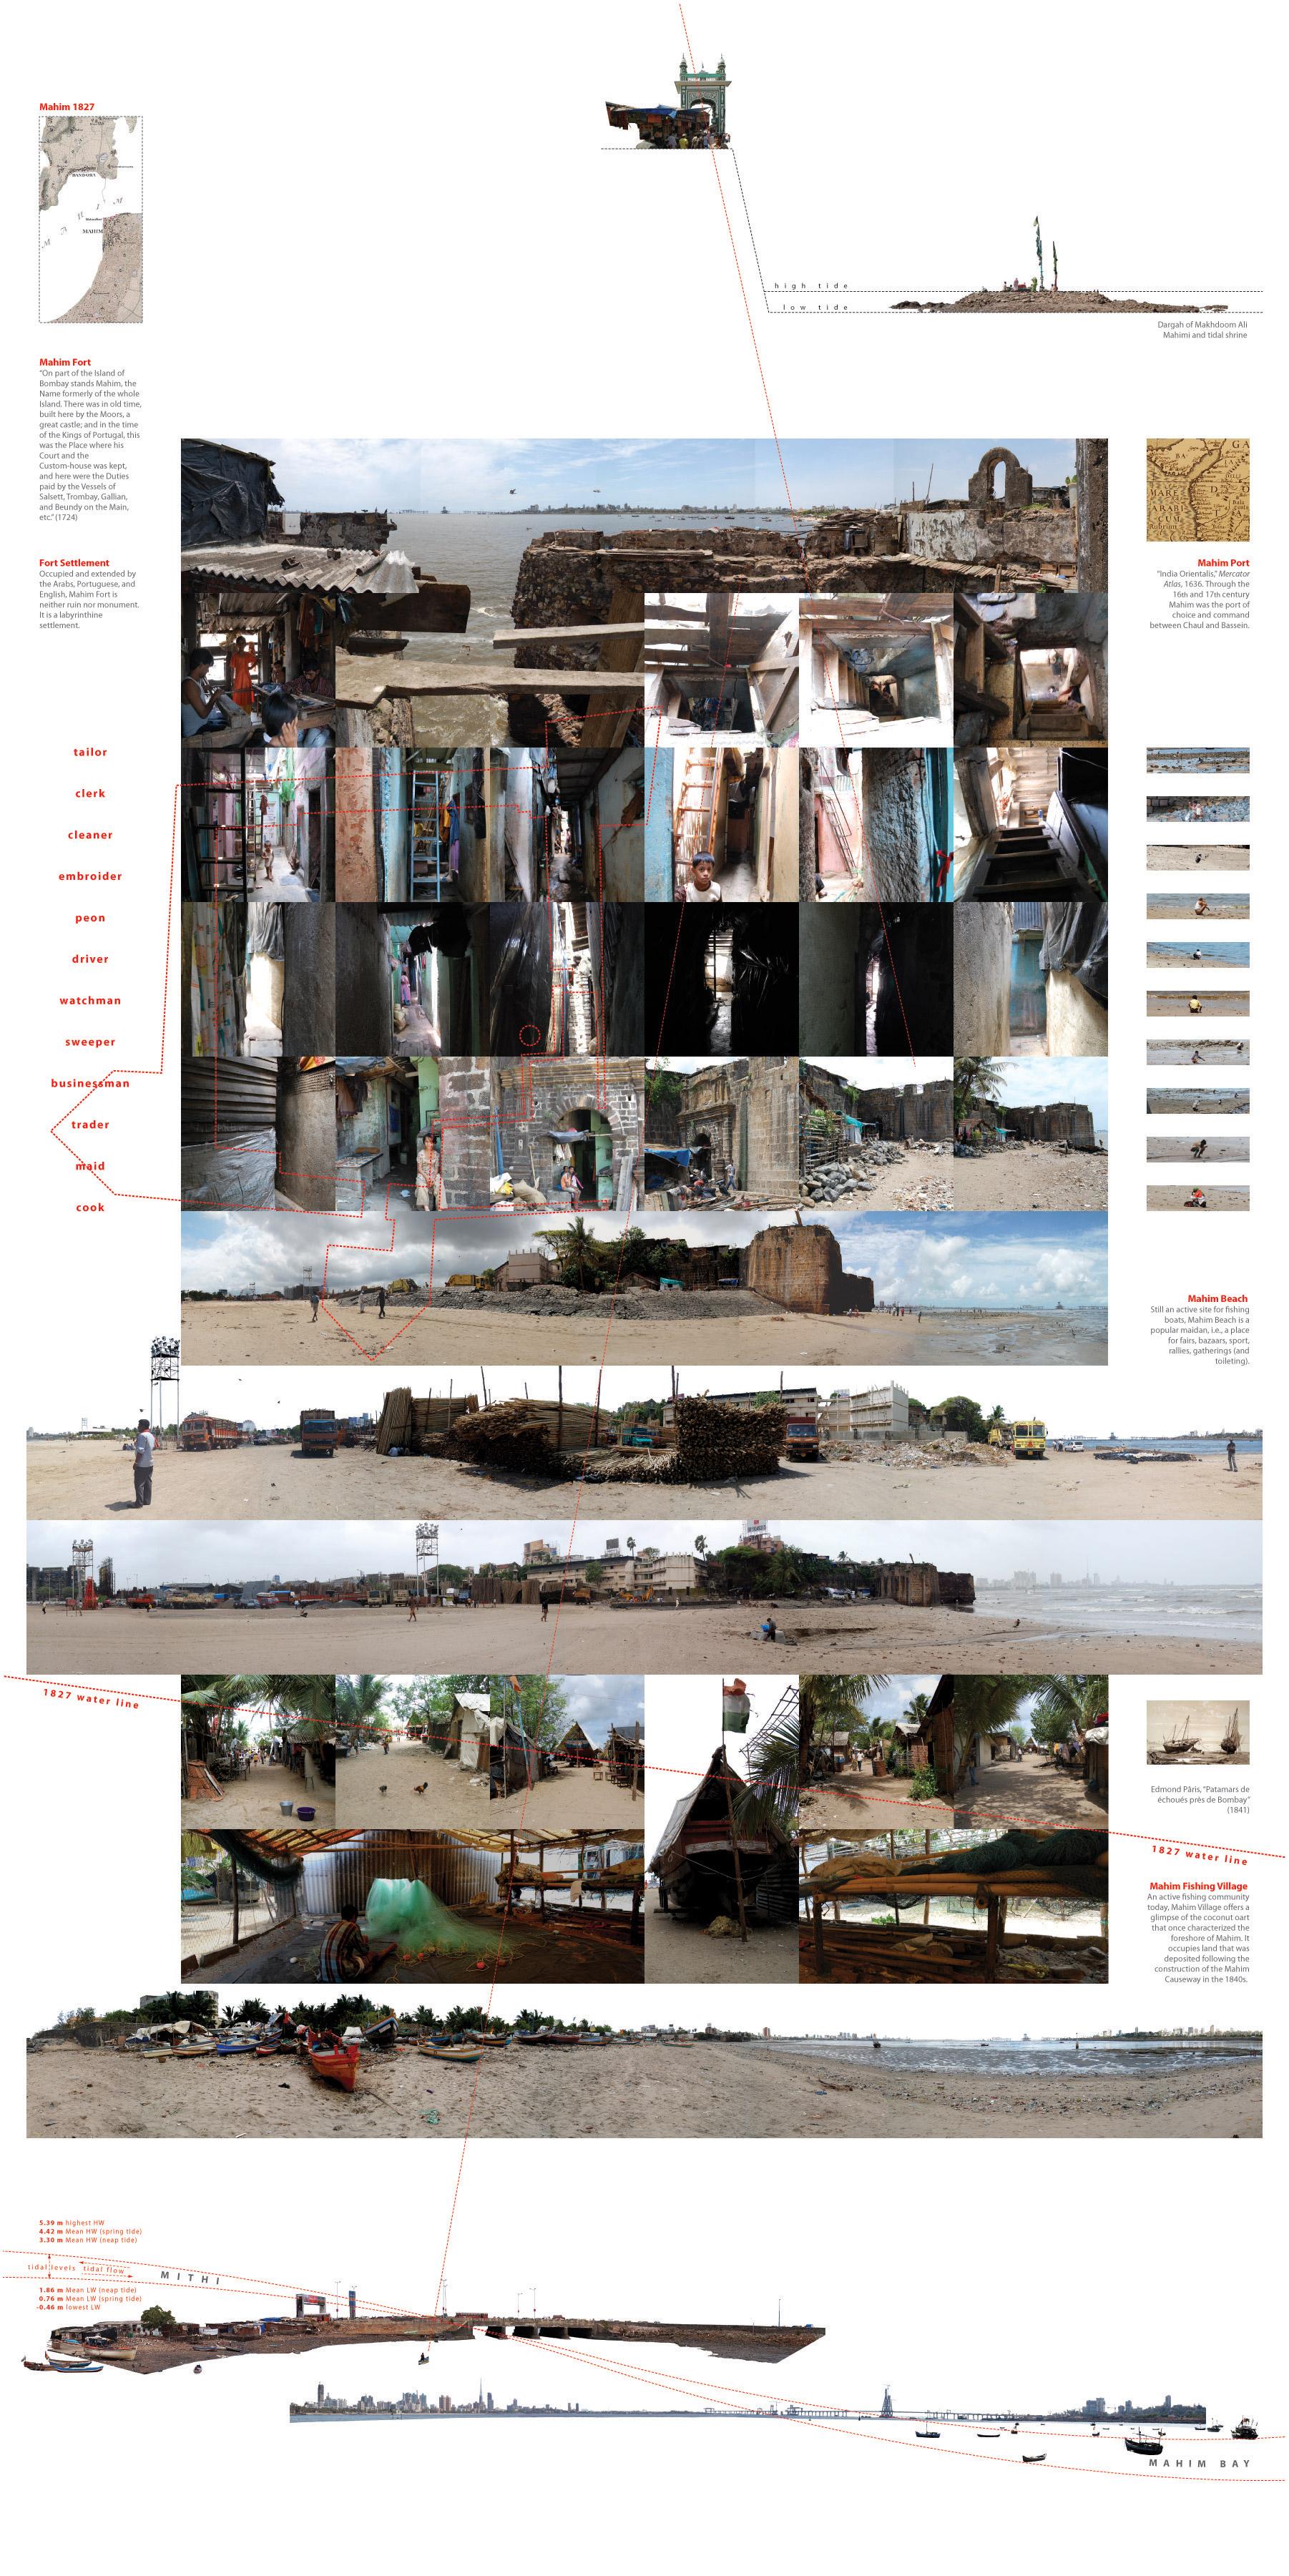 2A_mahim-fort-photowork-web.jpg